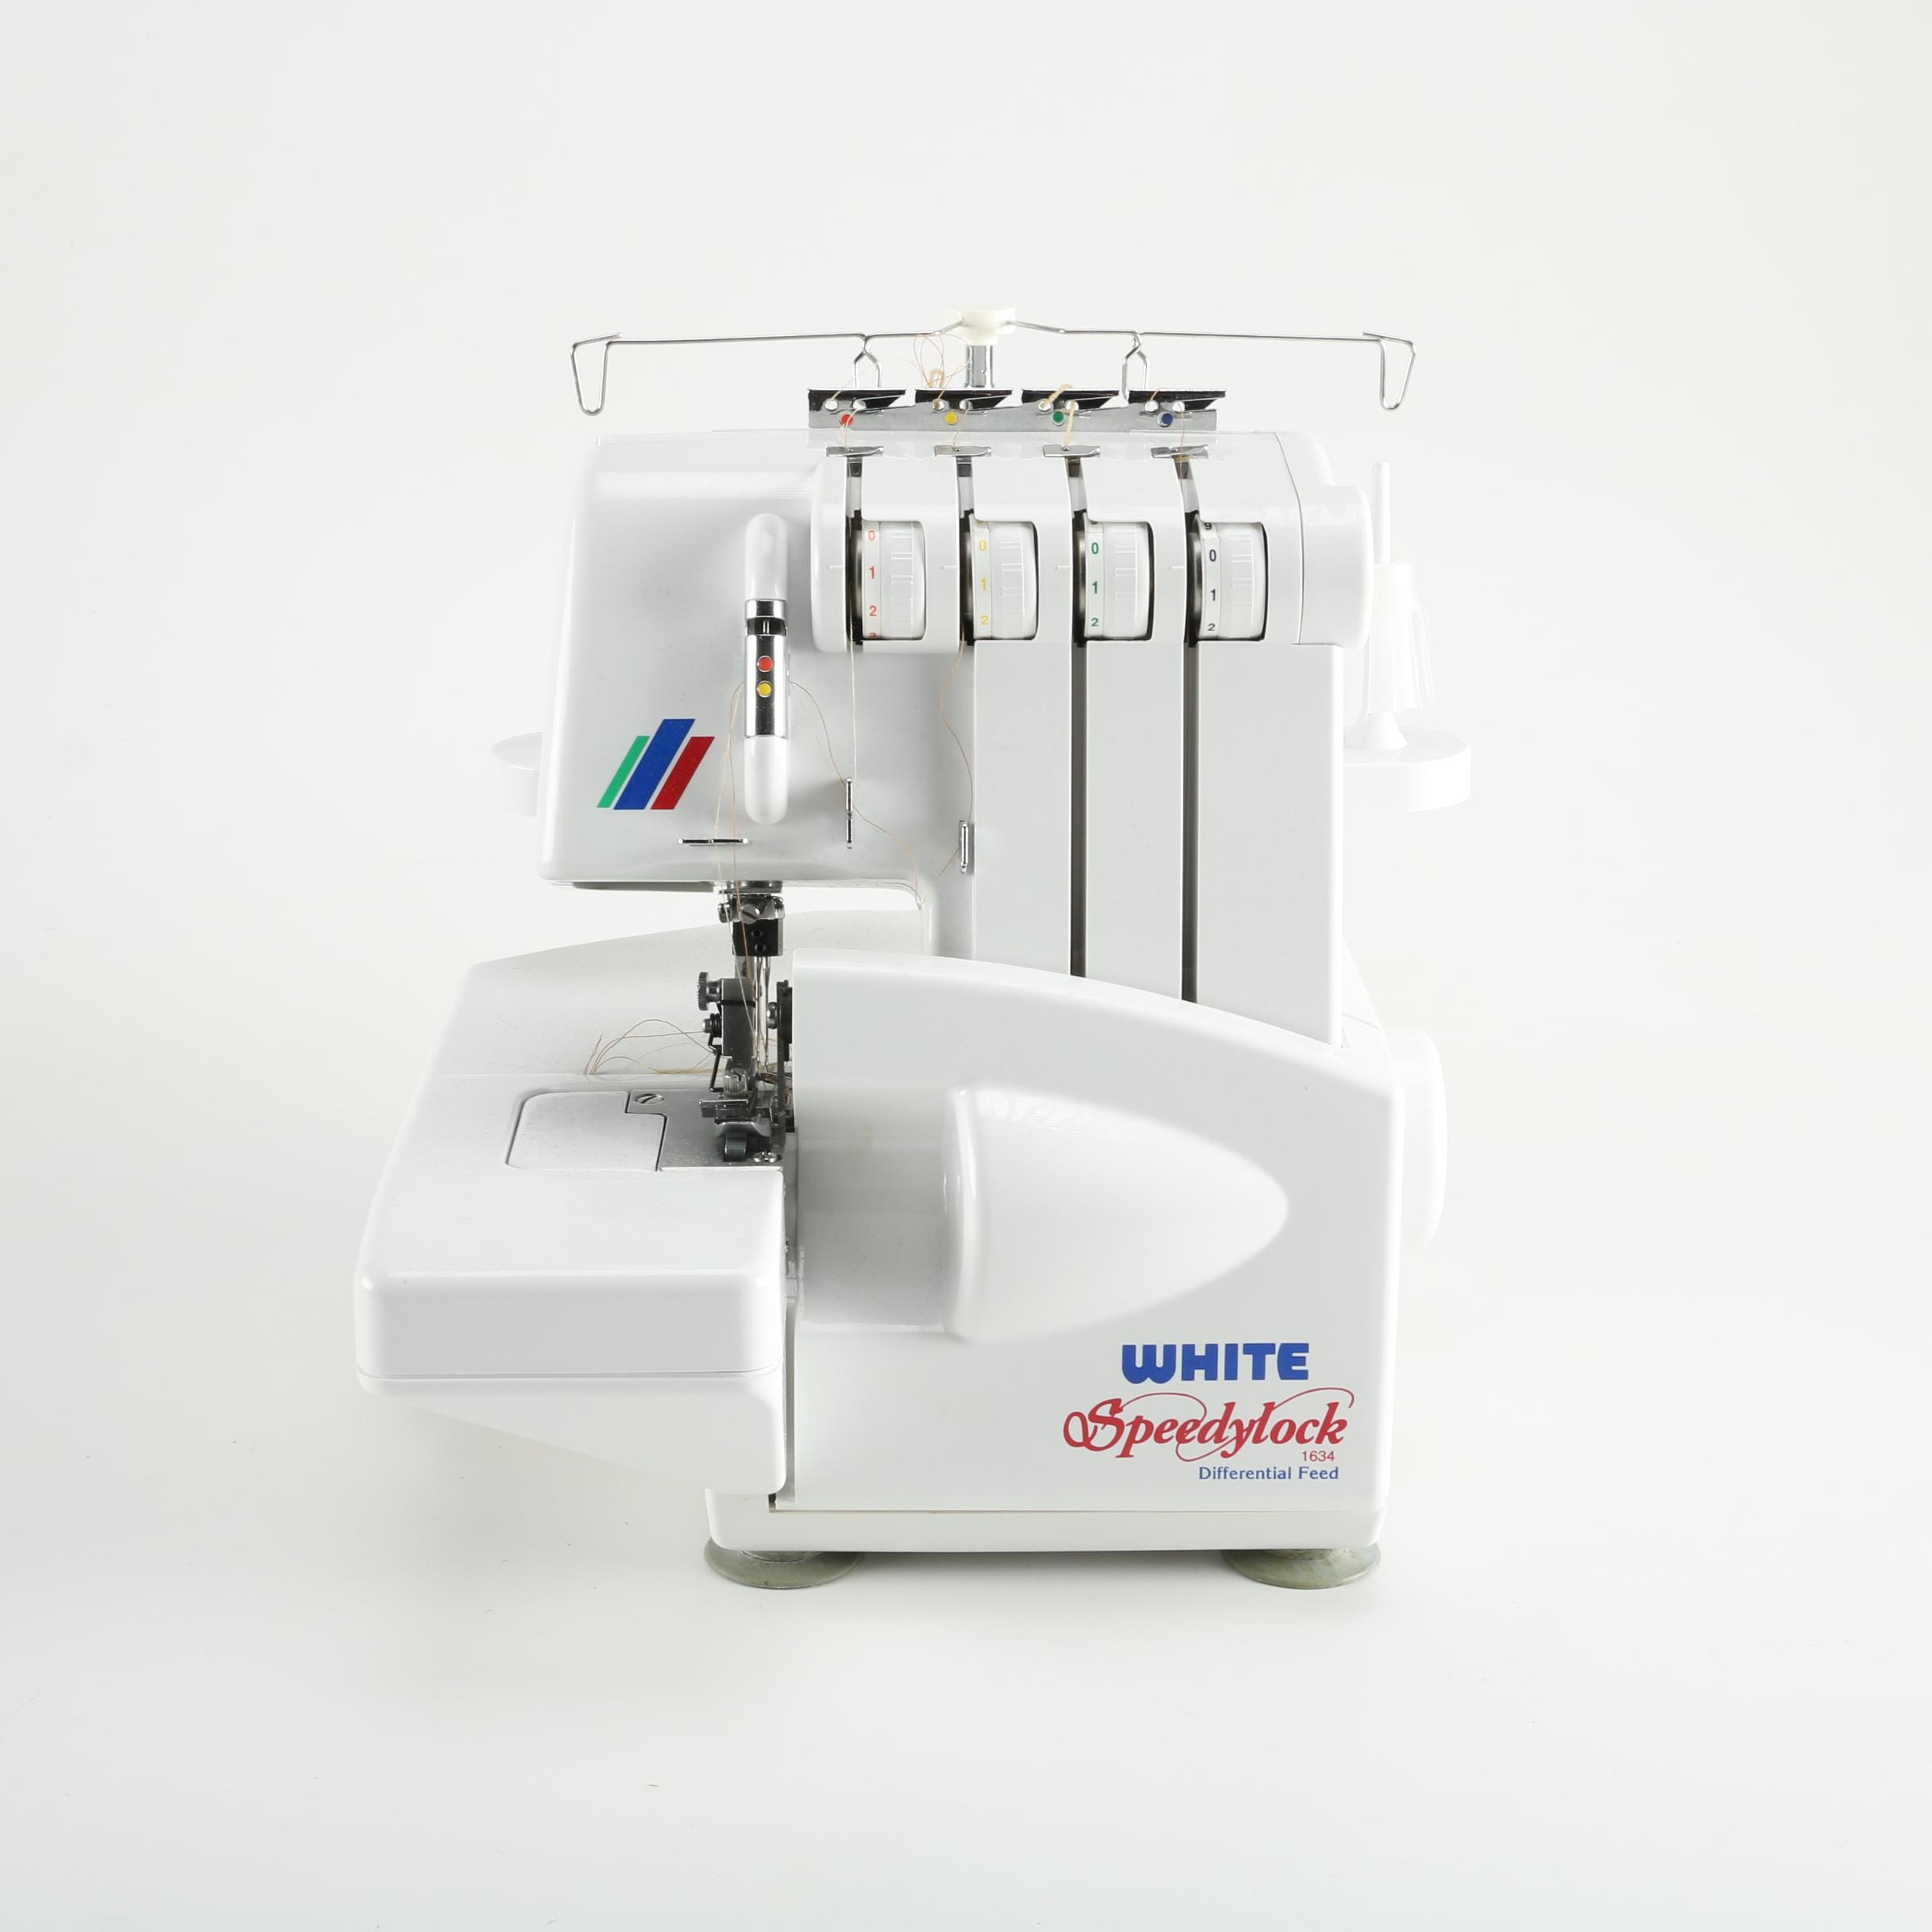 white speedylock serger sewing machine